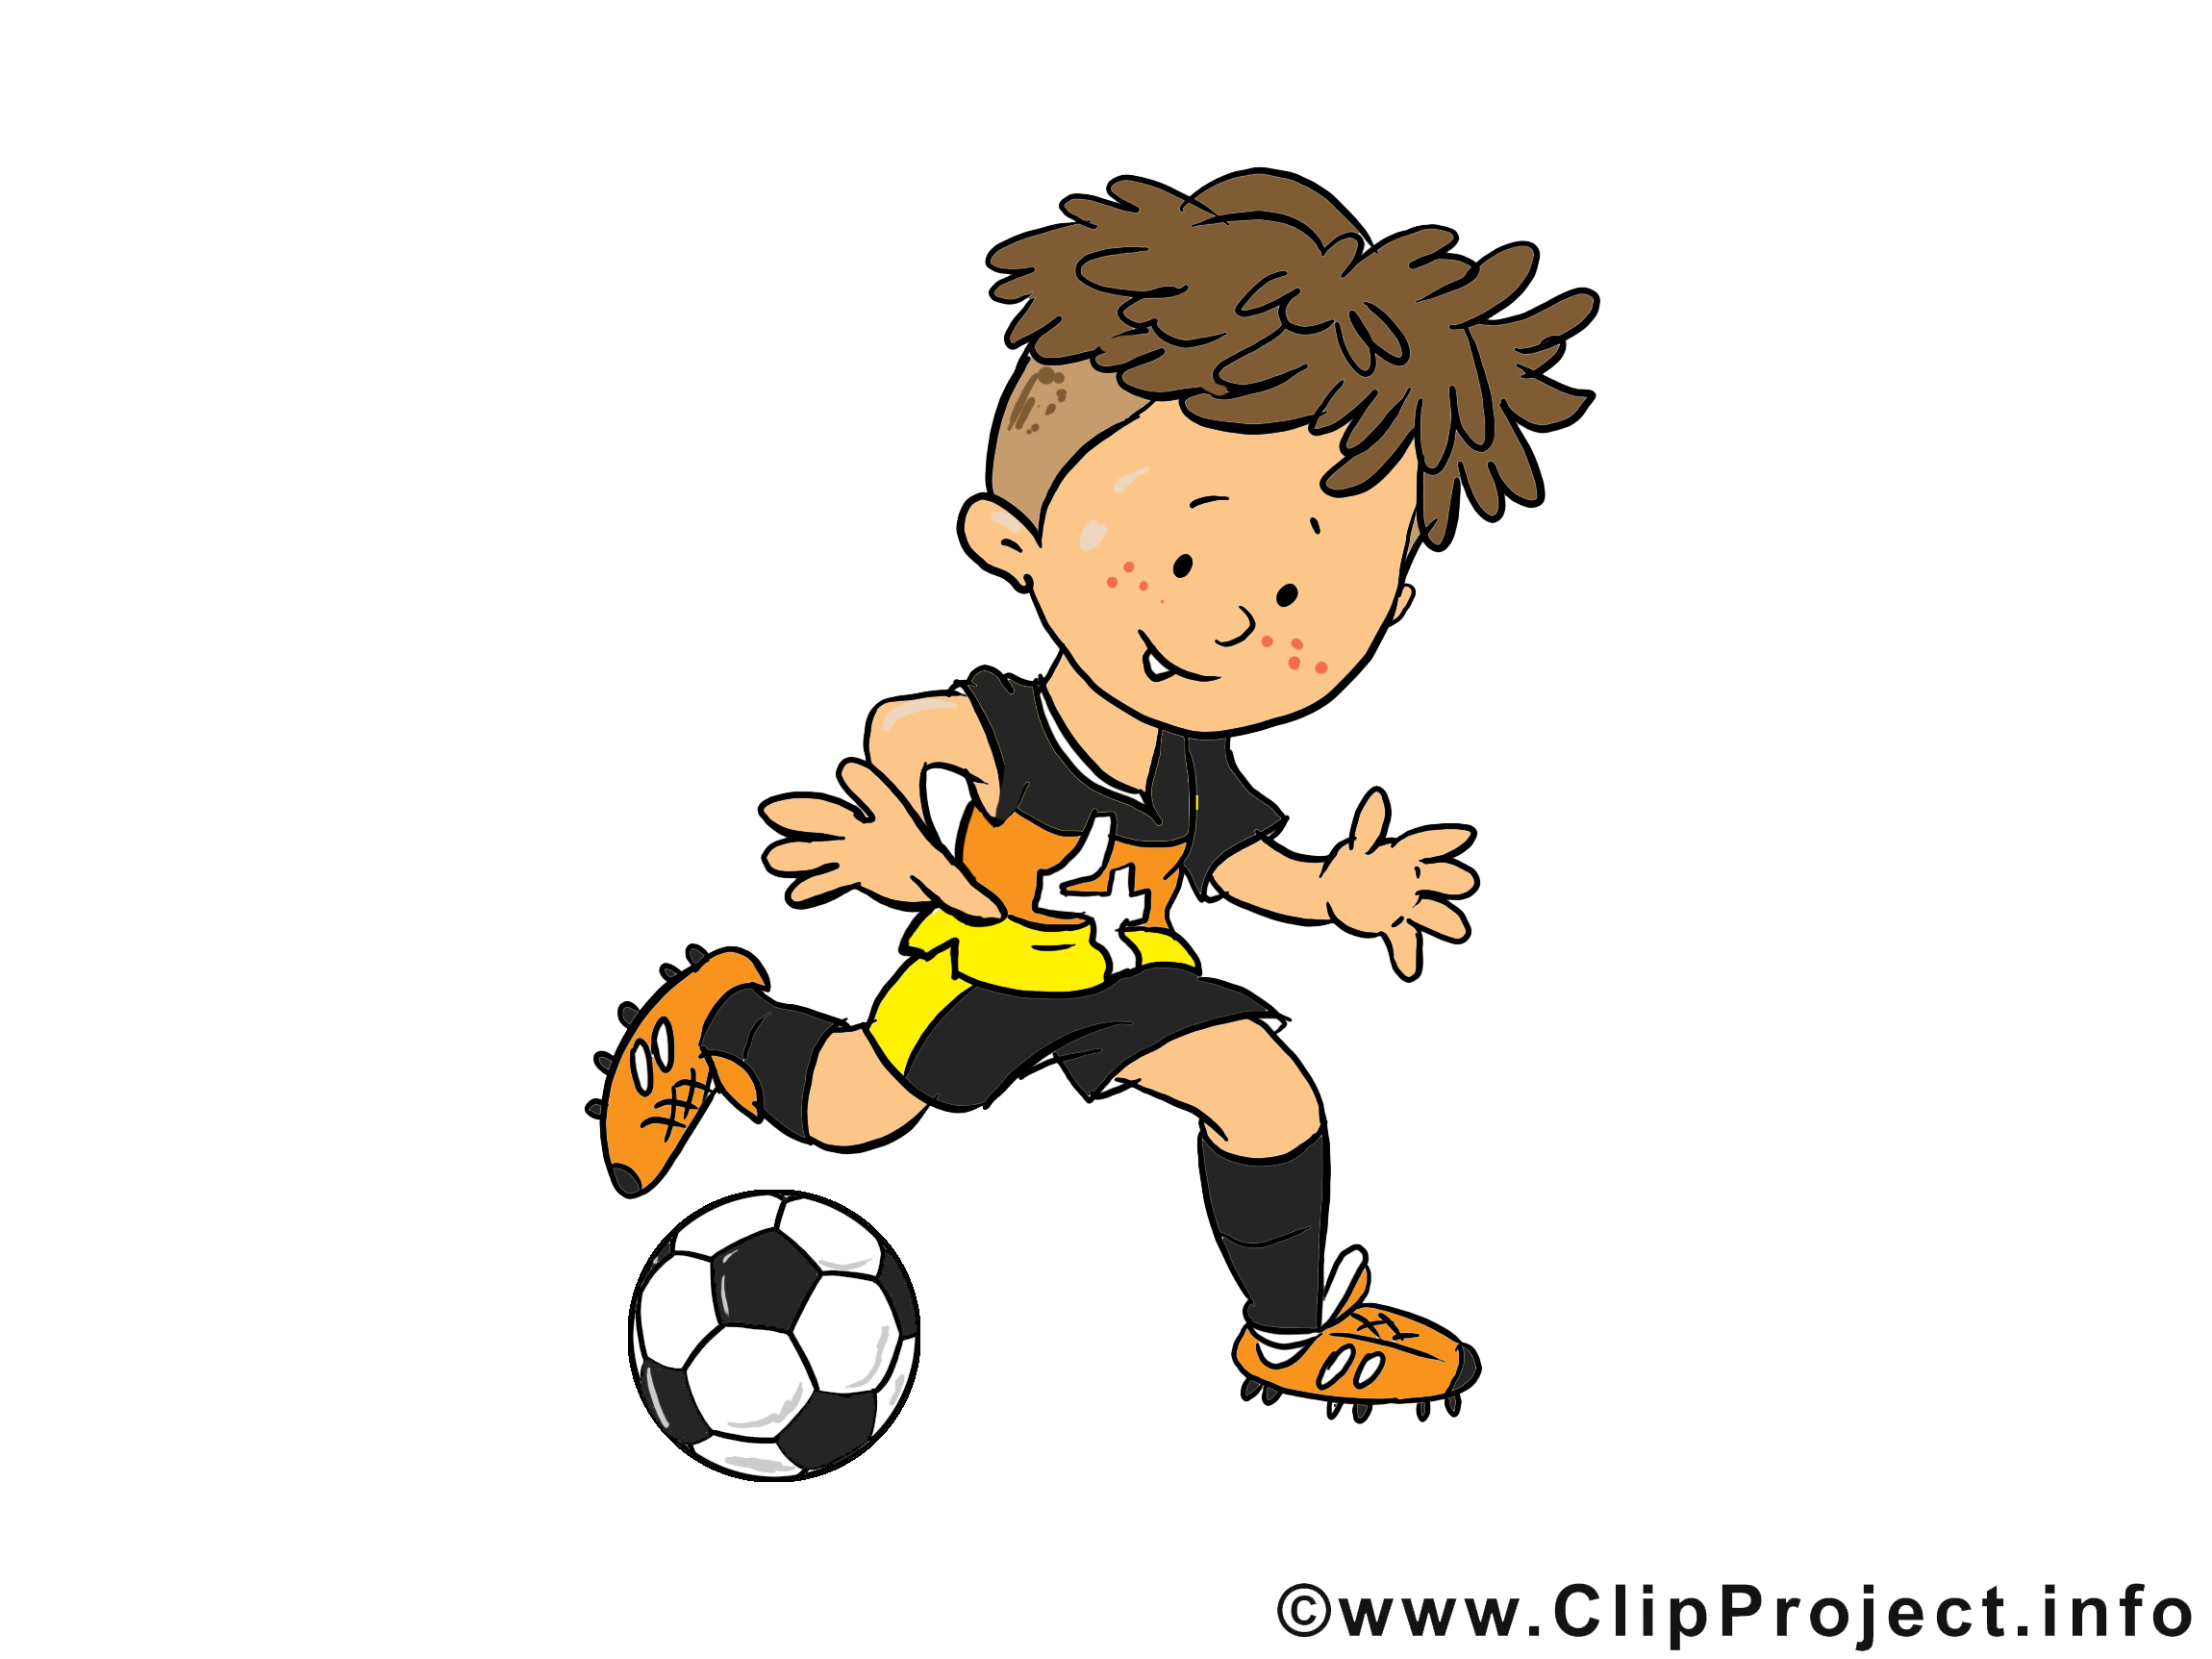 Garçon dessin gratuit - Football image